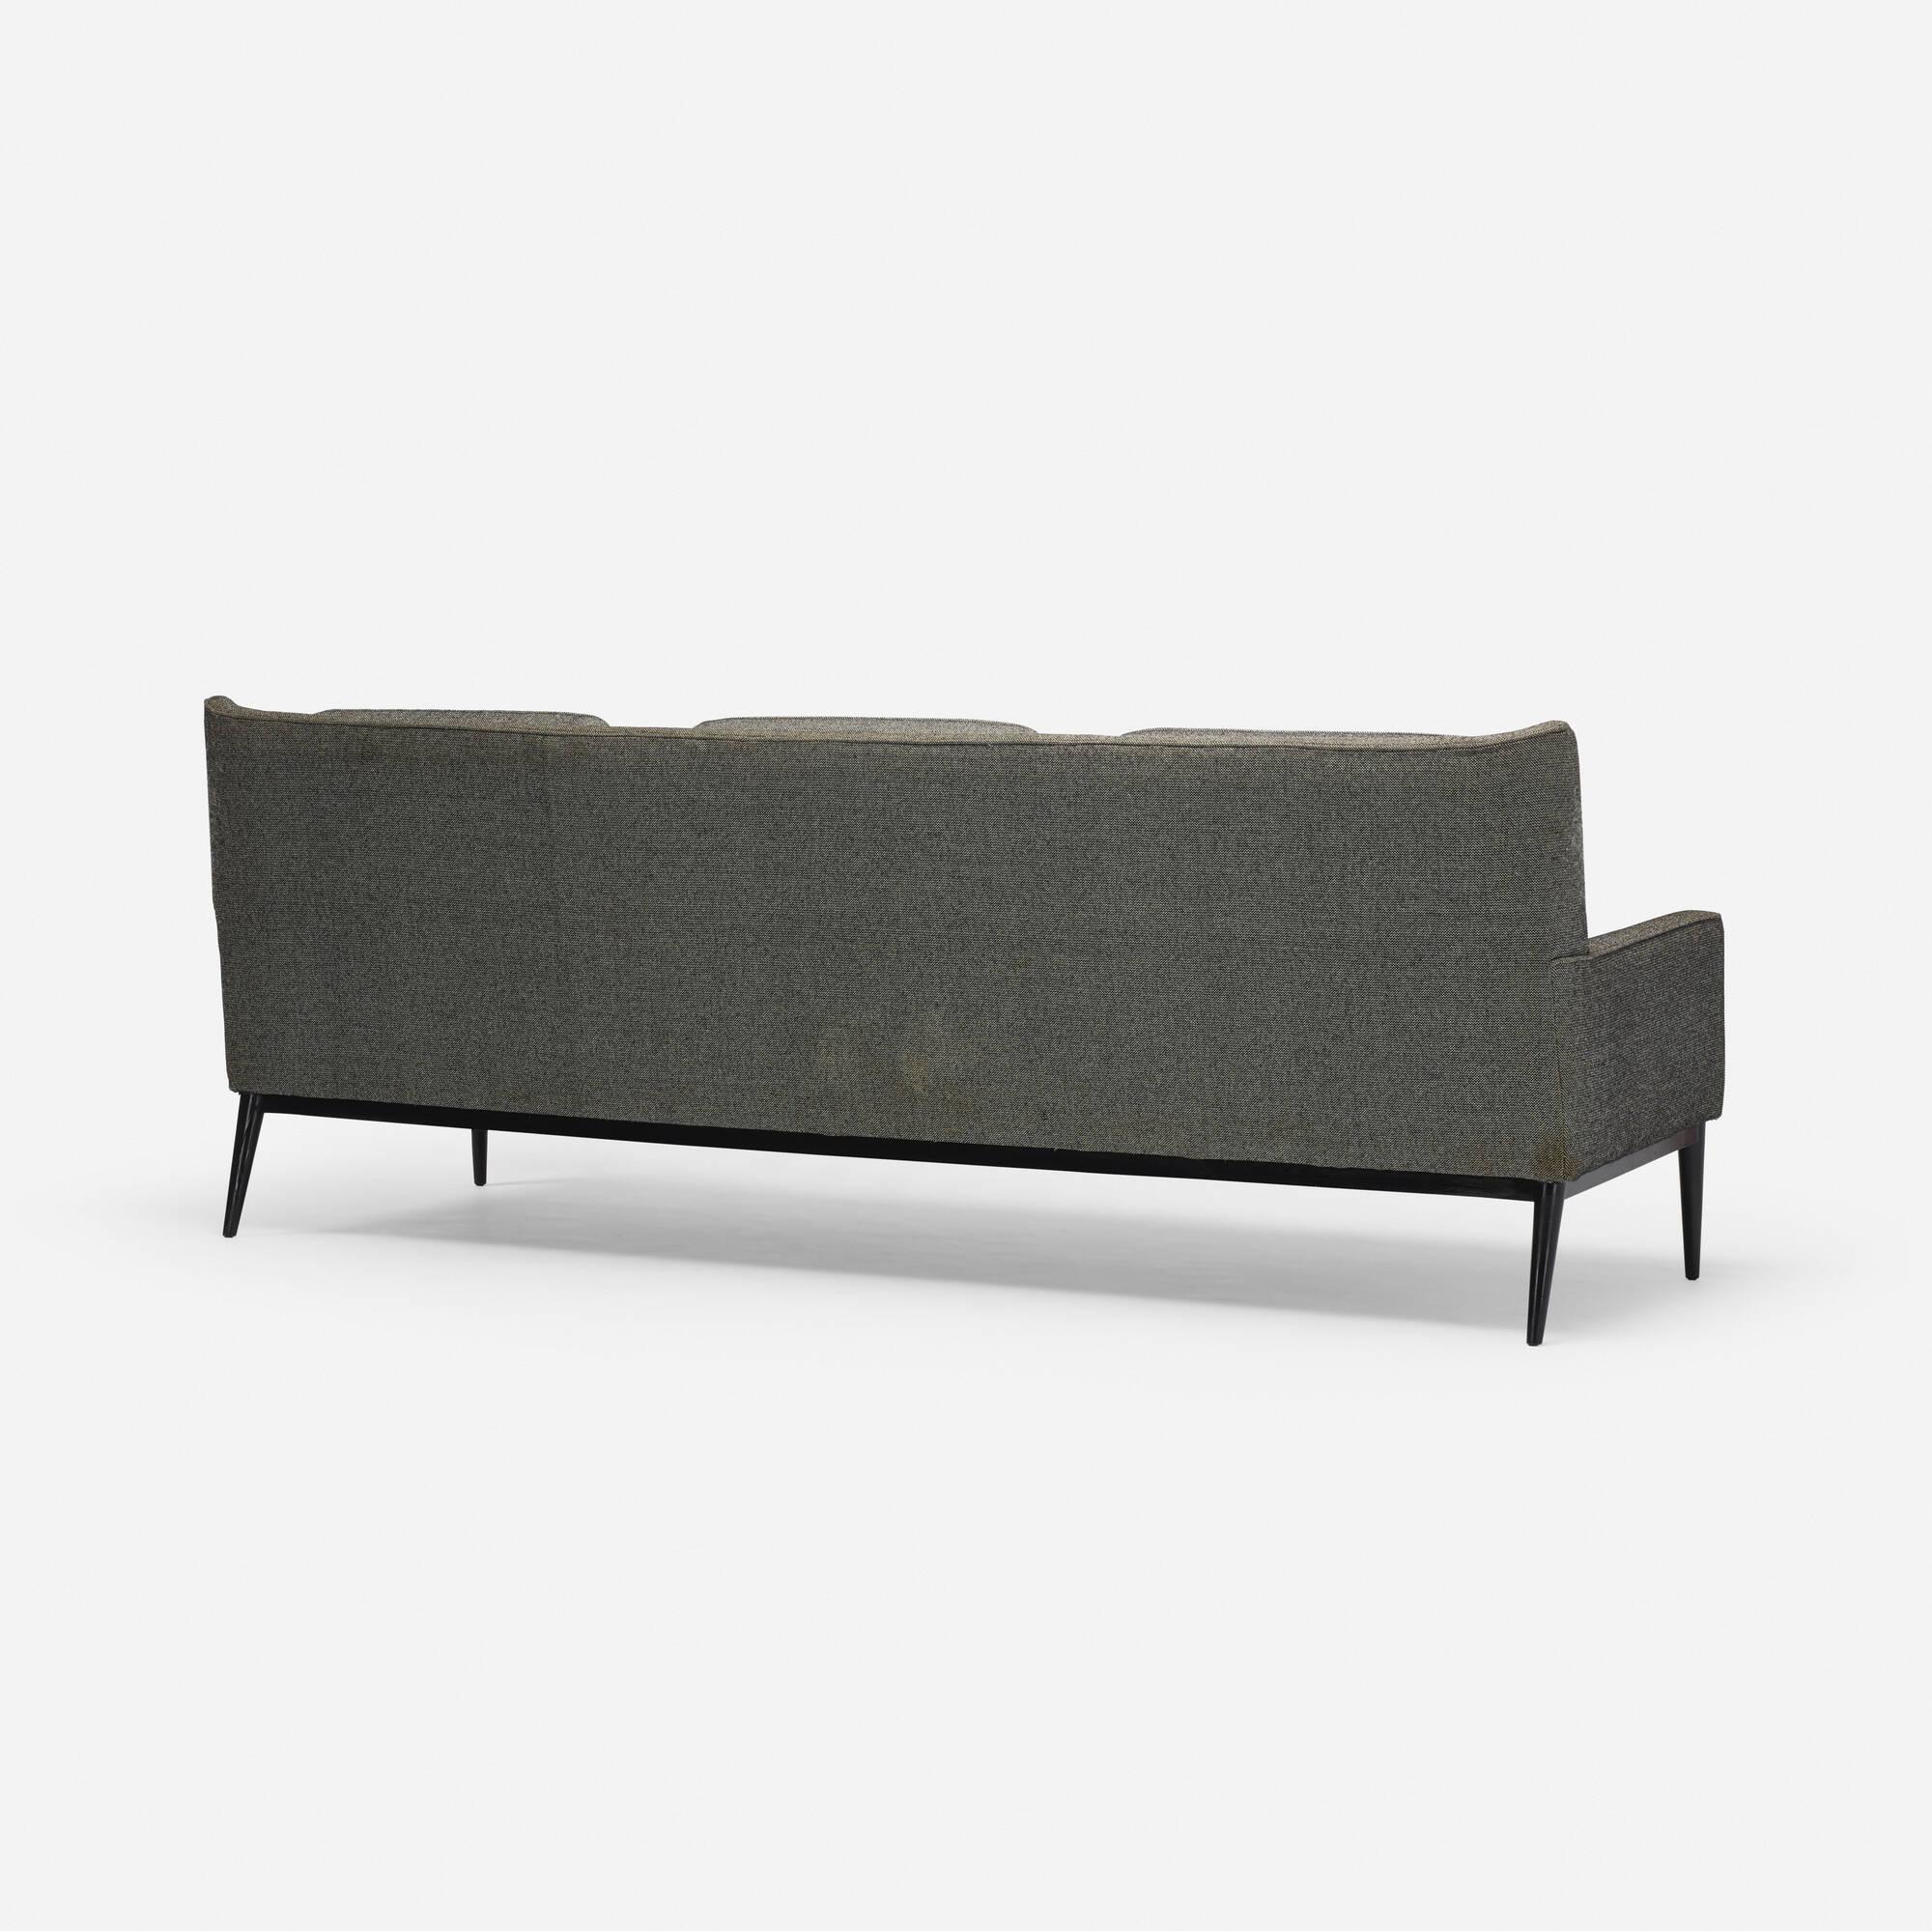 557: Paul McCobb / sofa (2 of 3)